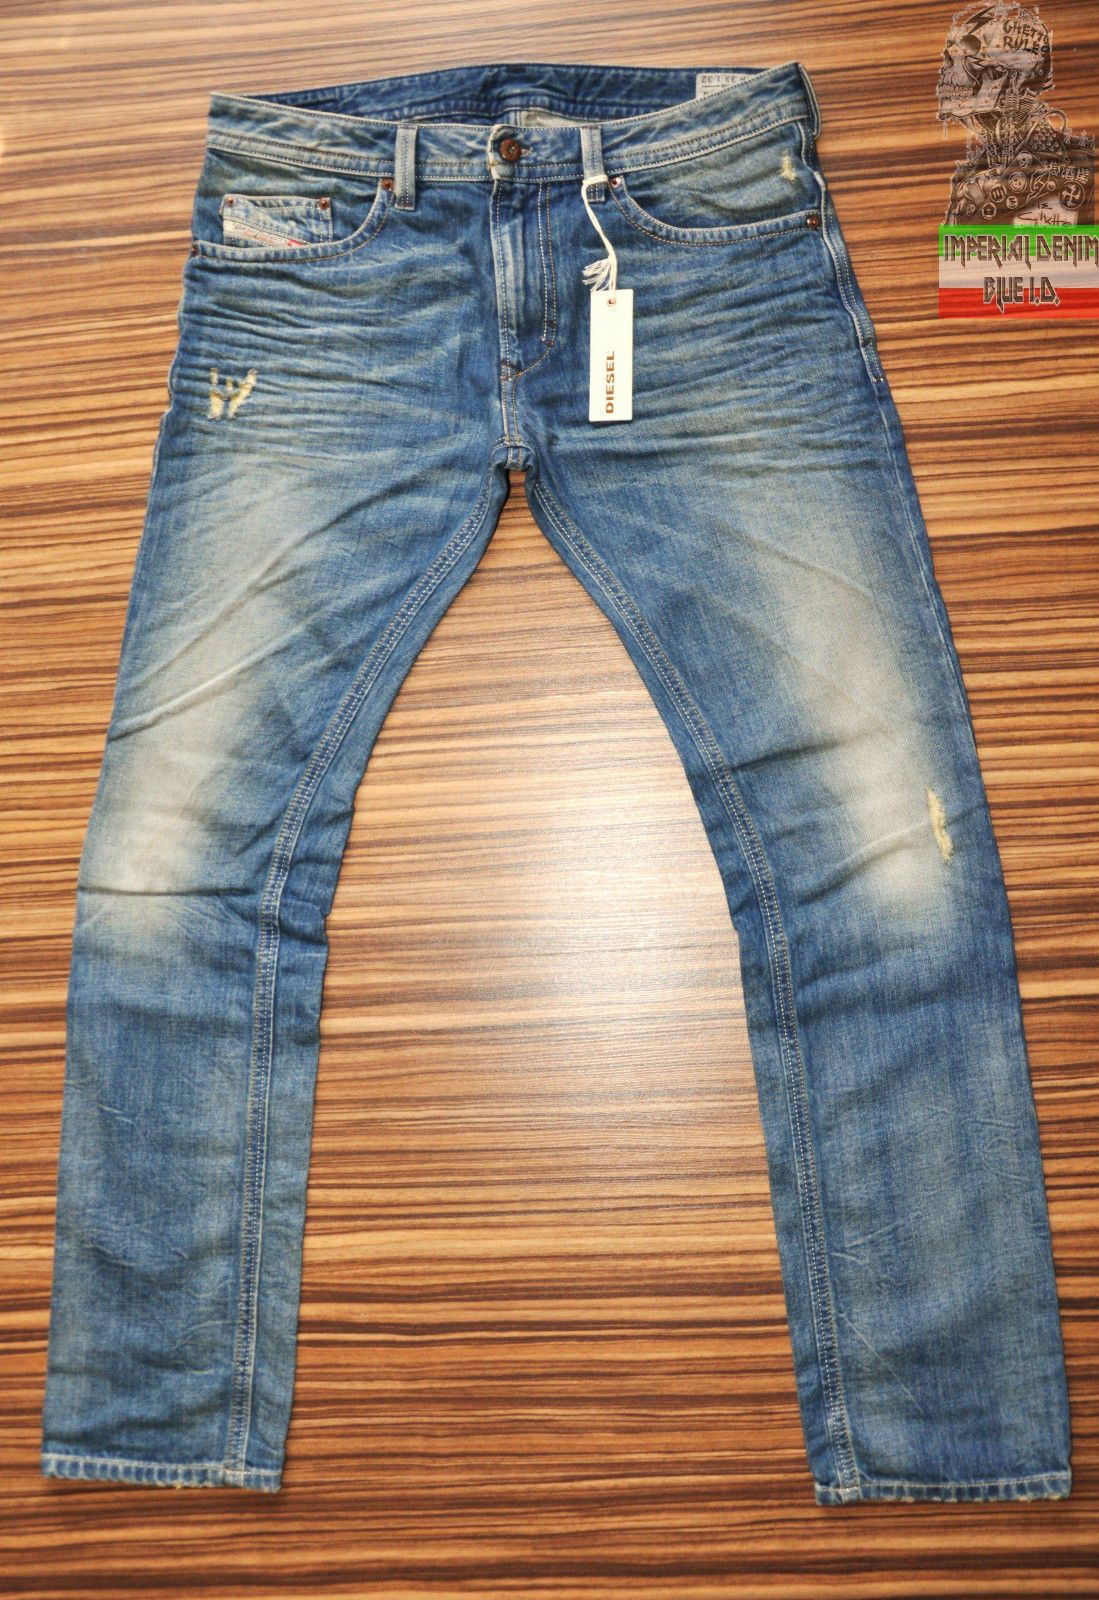 Diesel Thavar 806p 0806p Mens Jeans New Slim Fit Skinny Leg Distressed Sandblast Mens Jeans Mens Jeans Guide Slim Fit Skinny